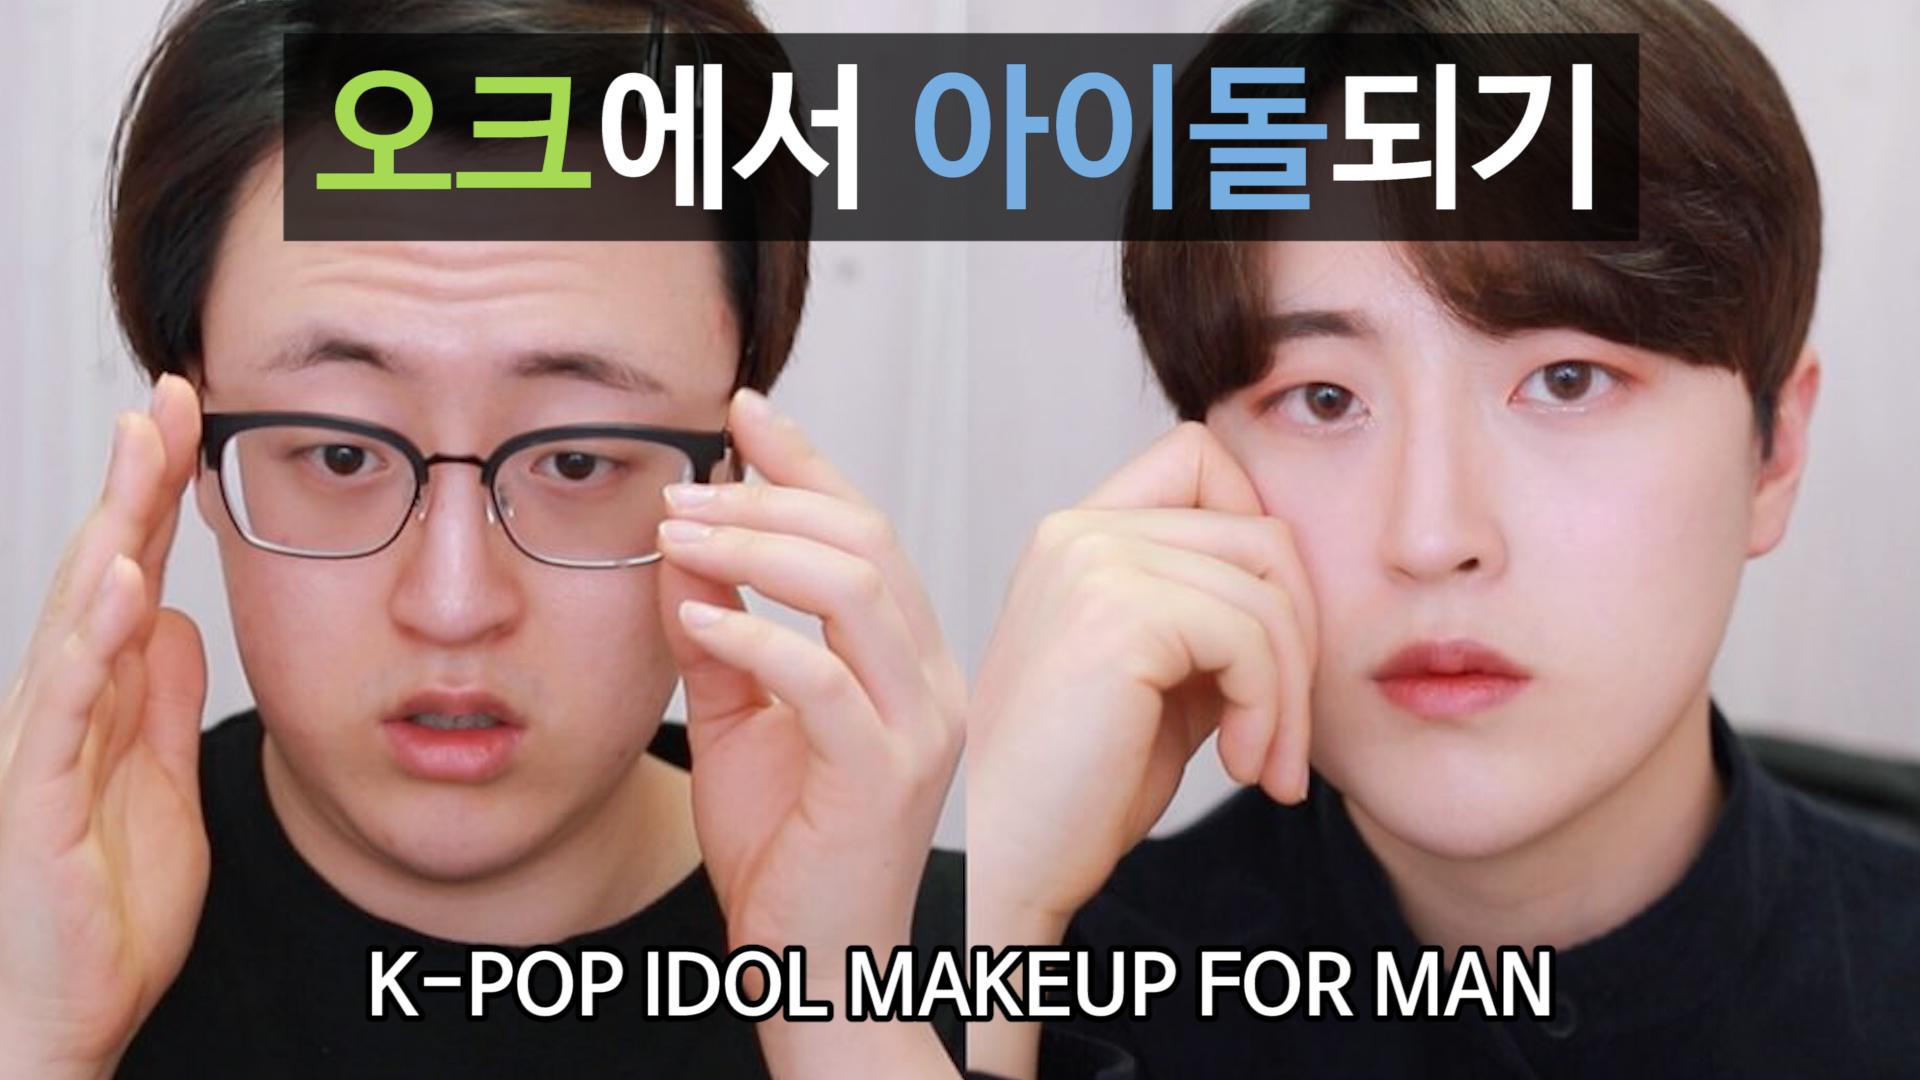 [ENG] 오크에서 아이돌되기 같이 준비해요! From messy to k-pop idol